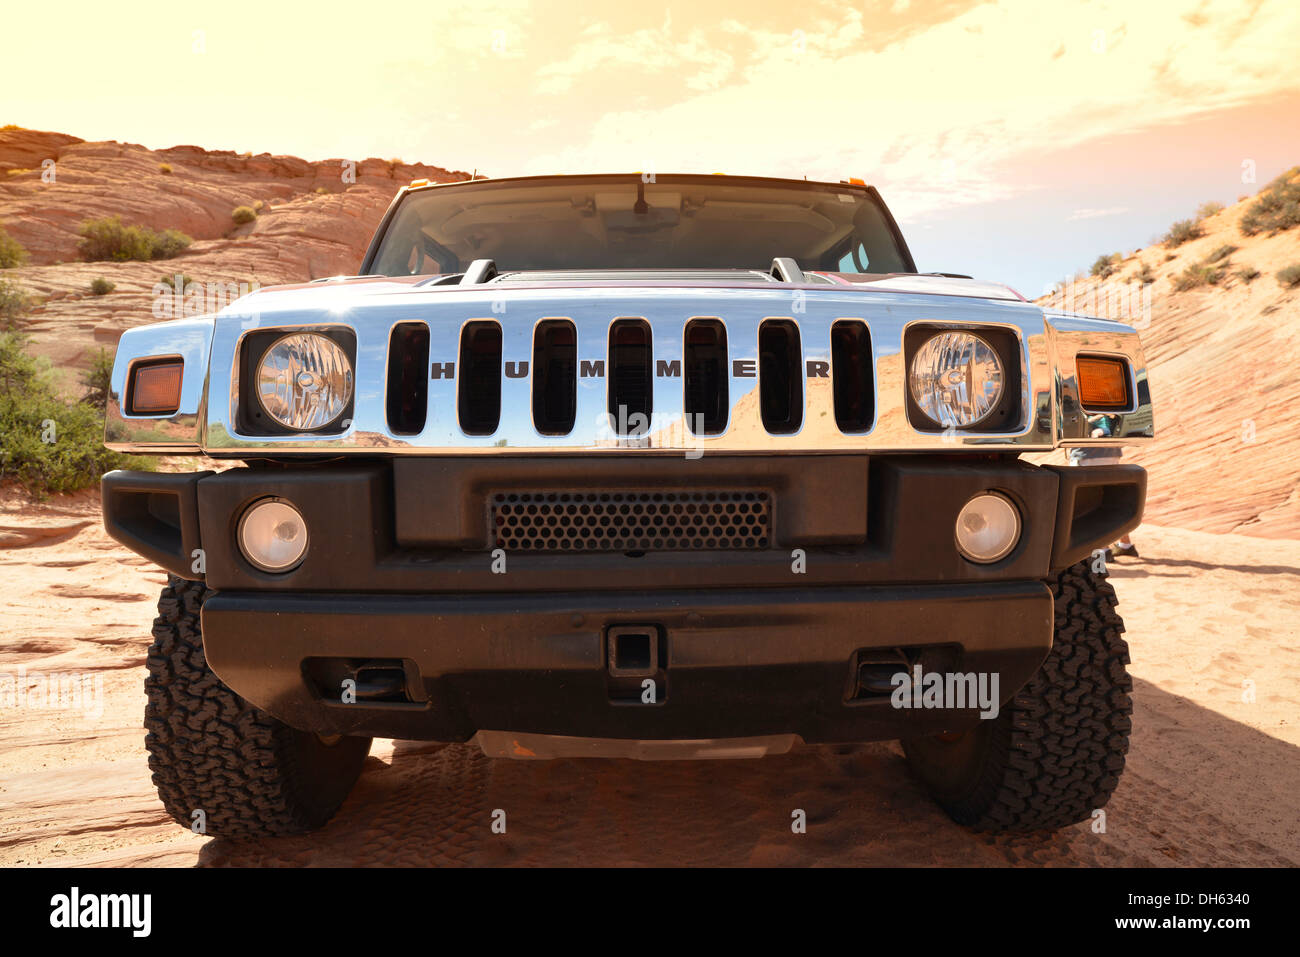 Radiator grill of a Hummer SUV 4WD, Page, Arizona, Southwestern USA, USA, PublicGround - Stock Image